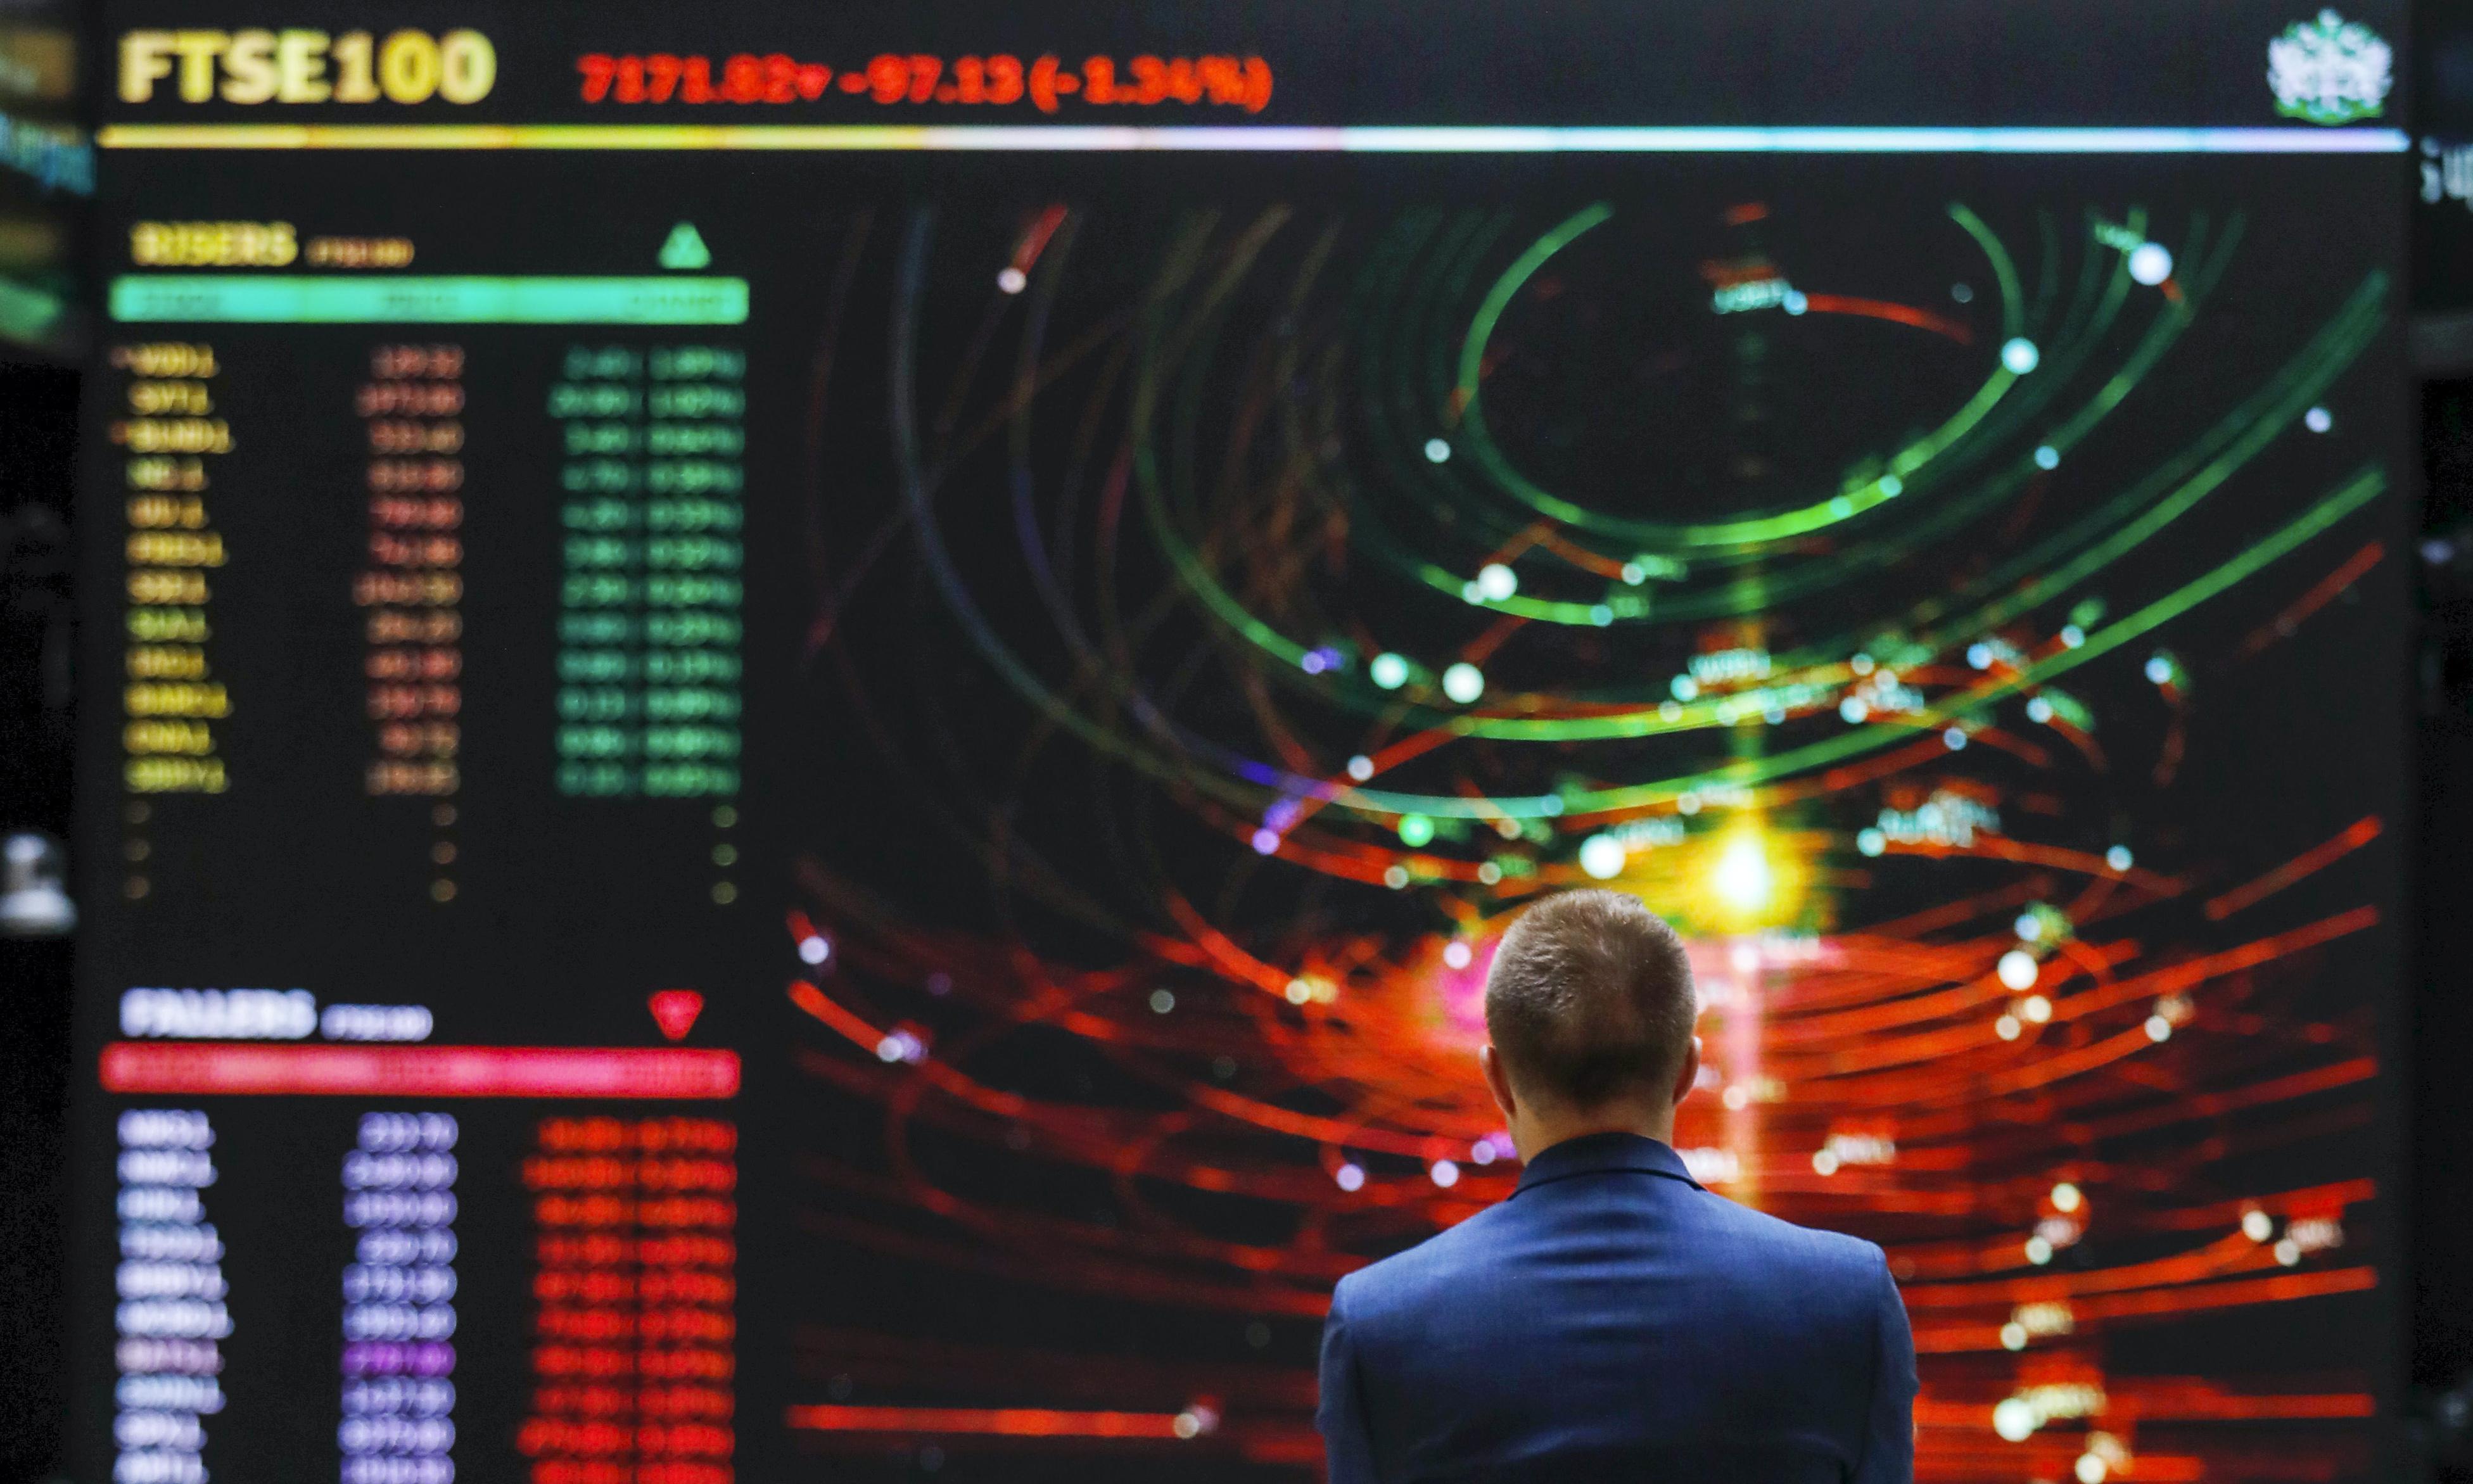 Hong Kong stock exchange makes £32bn bid for London counterpart